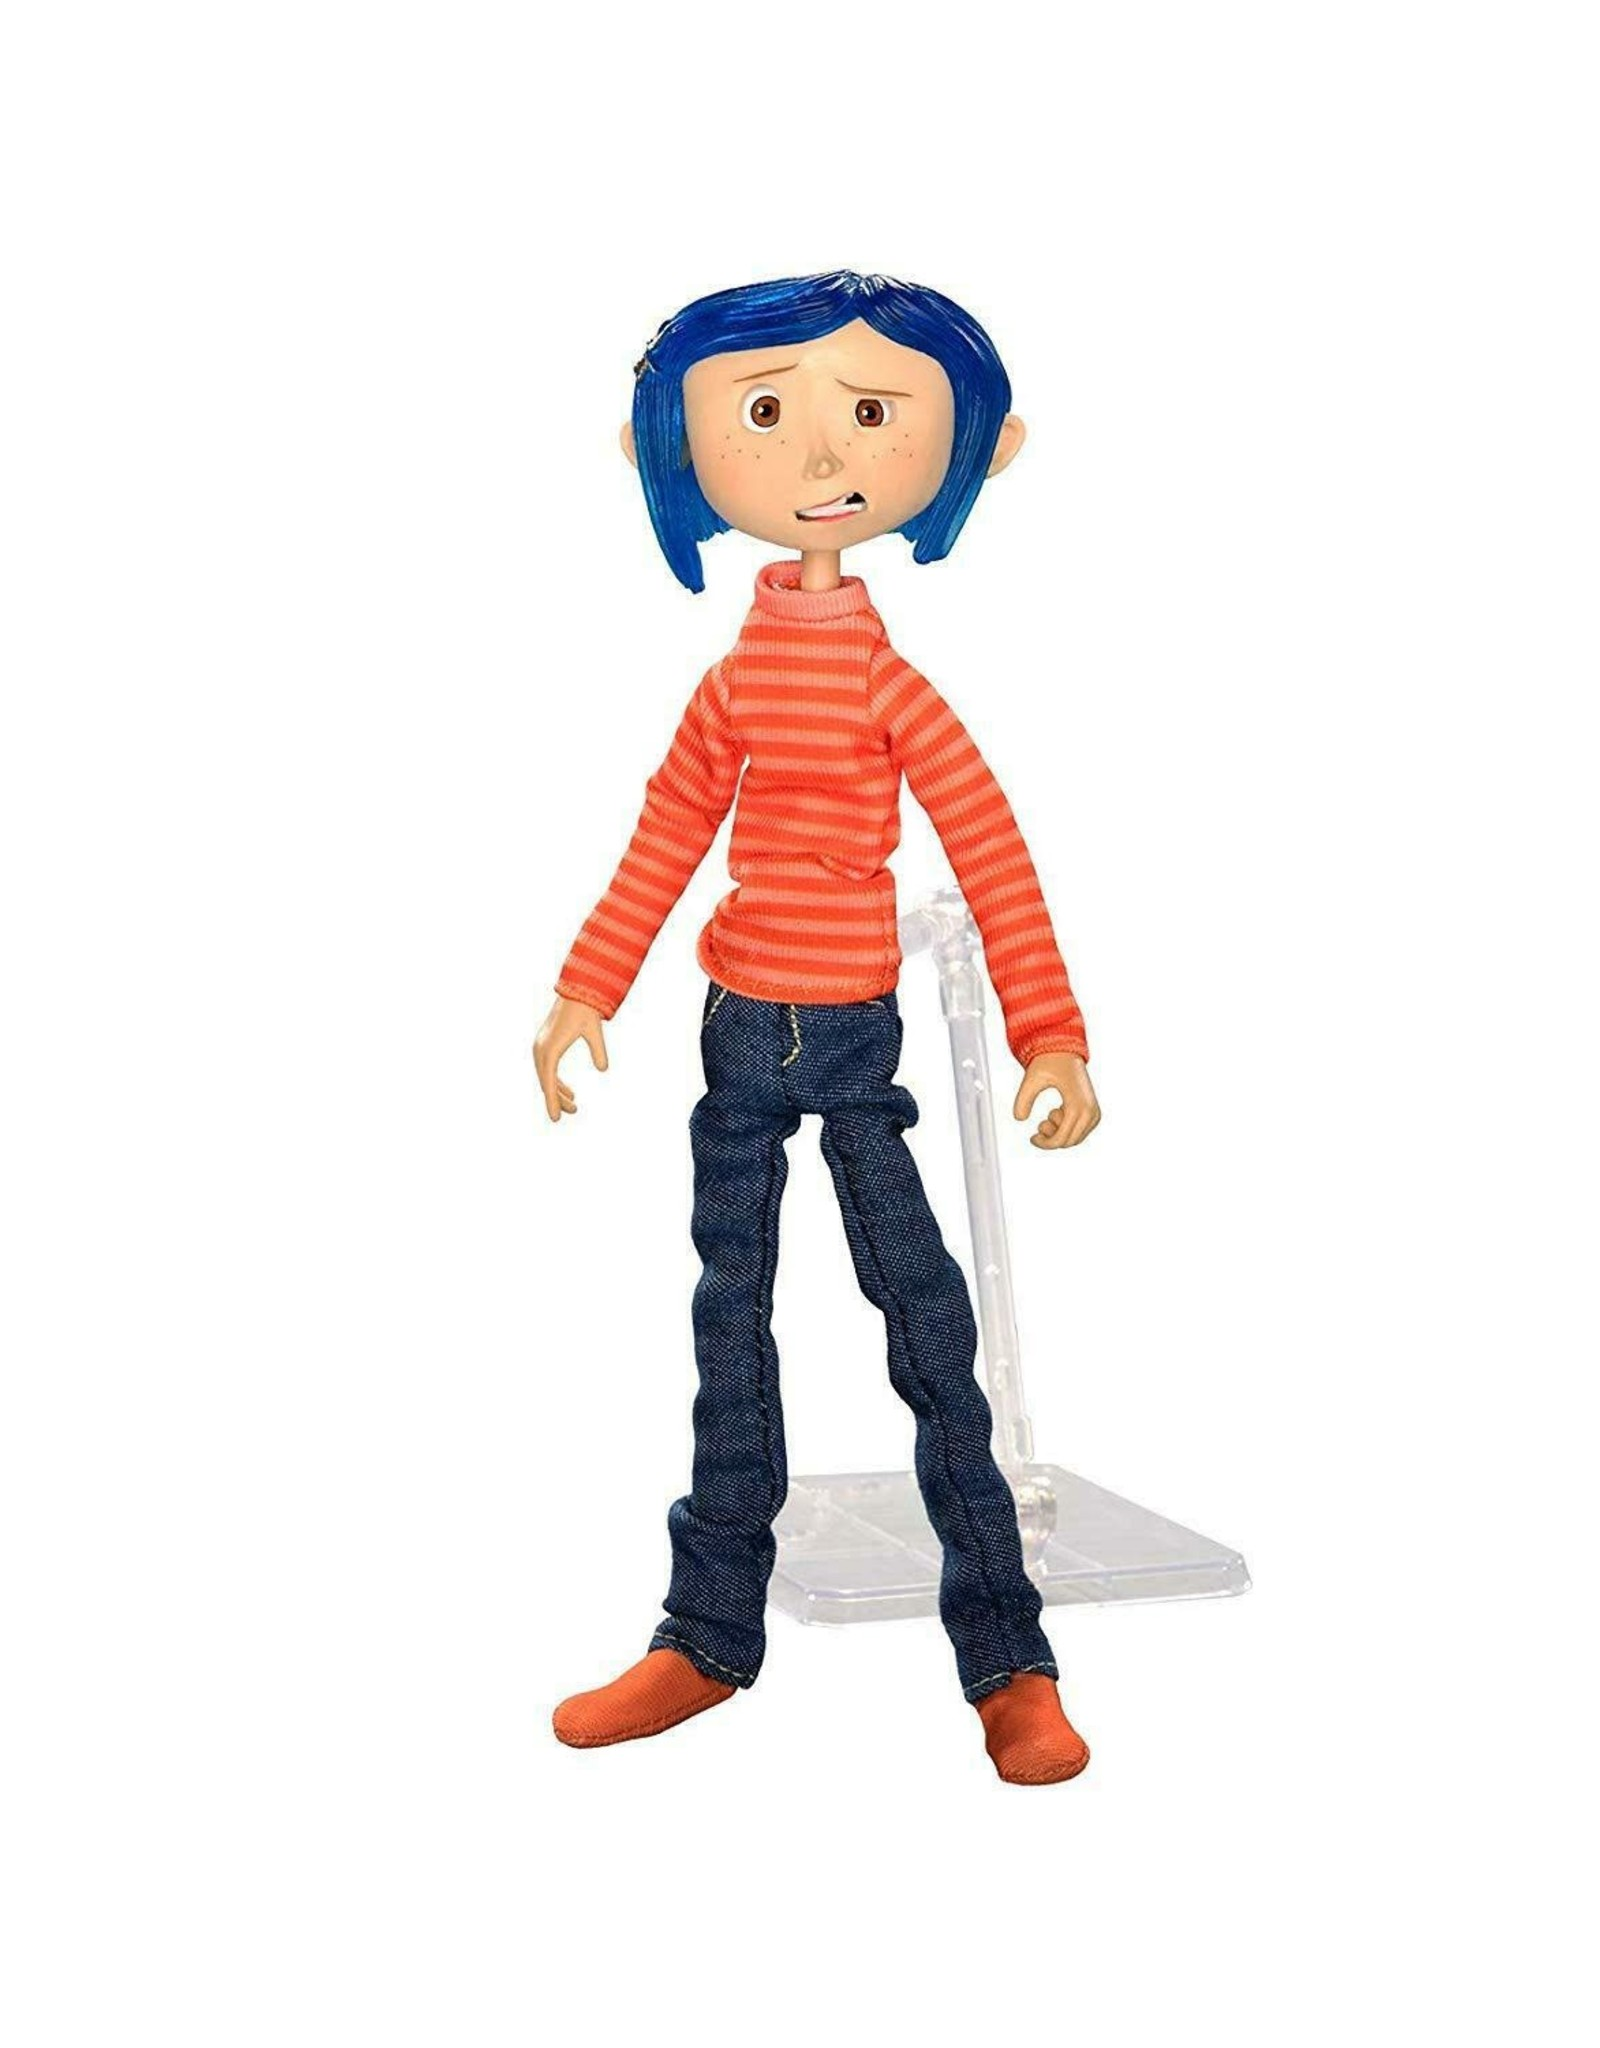 Coraline Action Figure